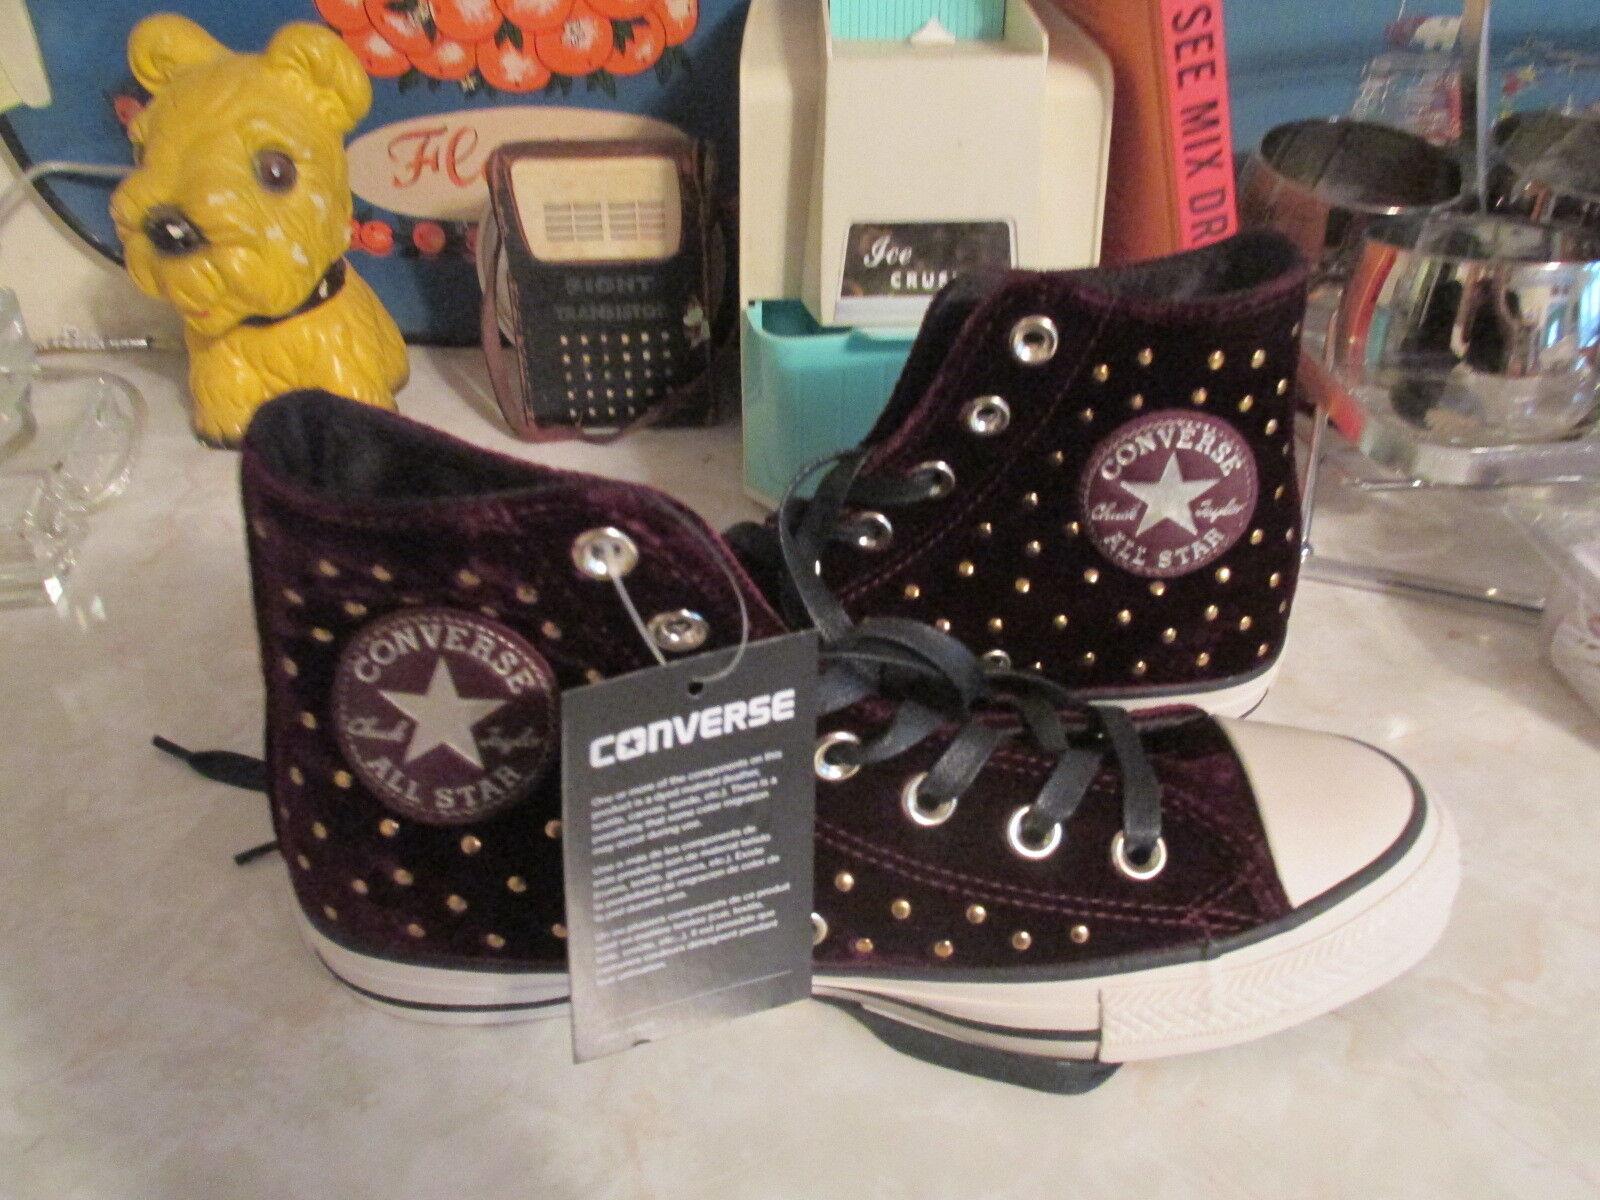 Converse All Star Sangria Velvet Studs High Top Sneakers Size 6 M Women's NWOB